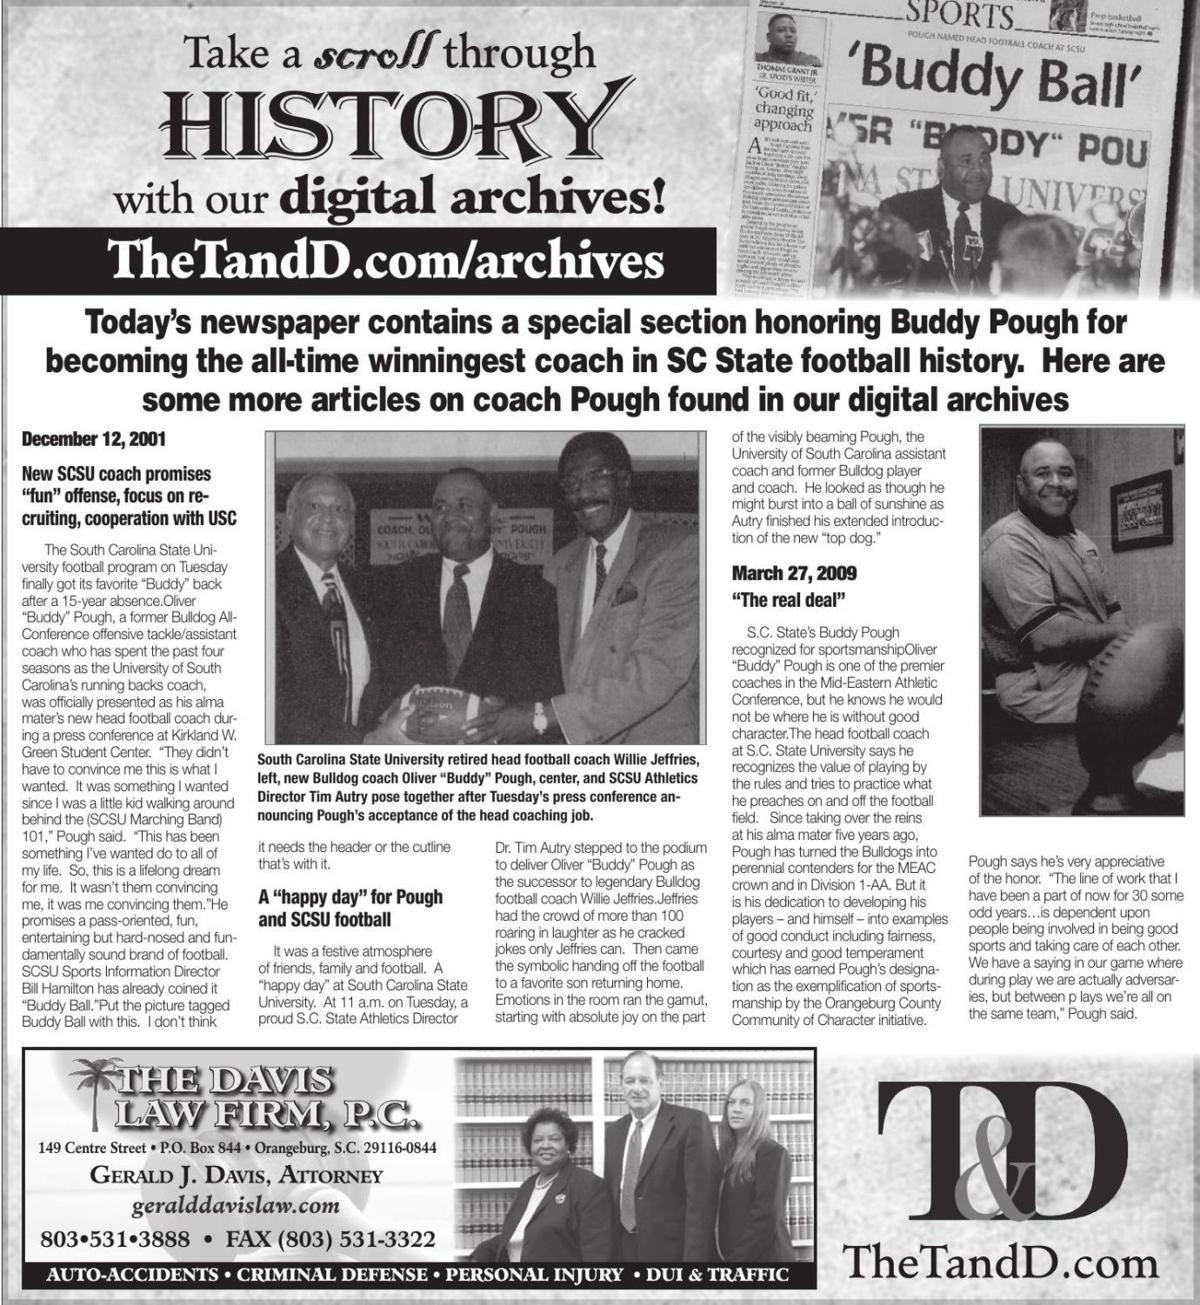 TheTandD.com/archives Nov. 3, 2019